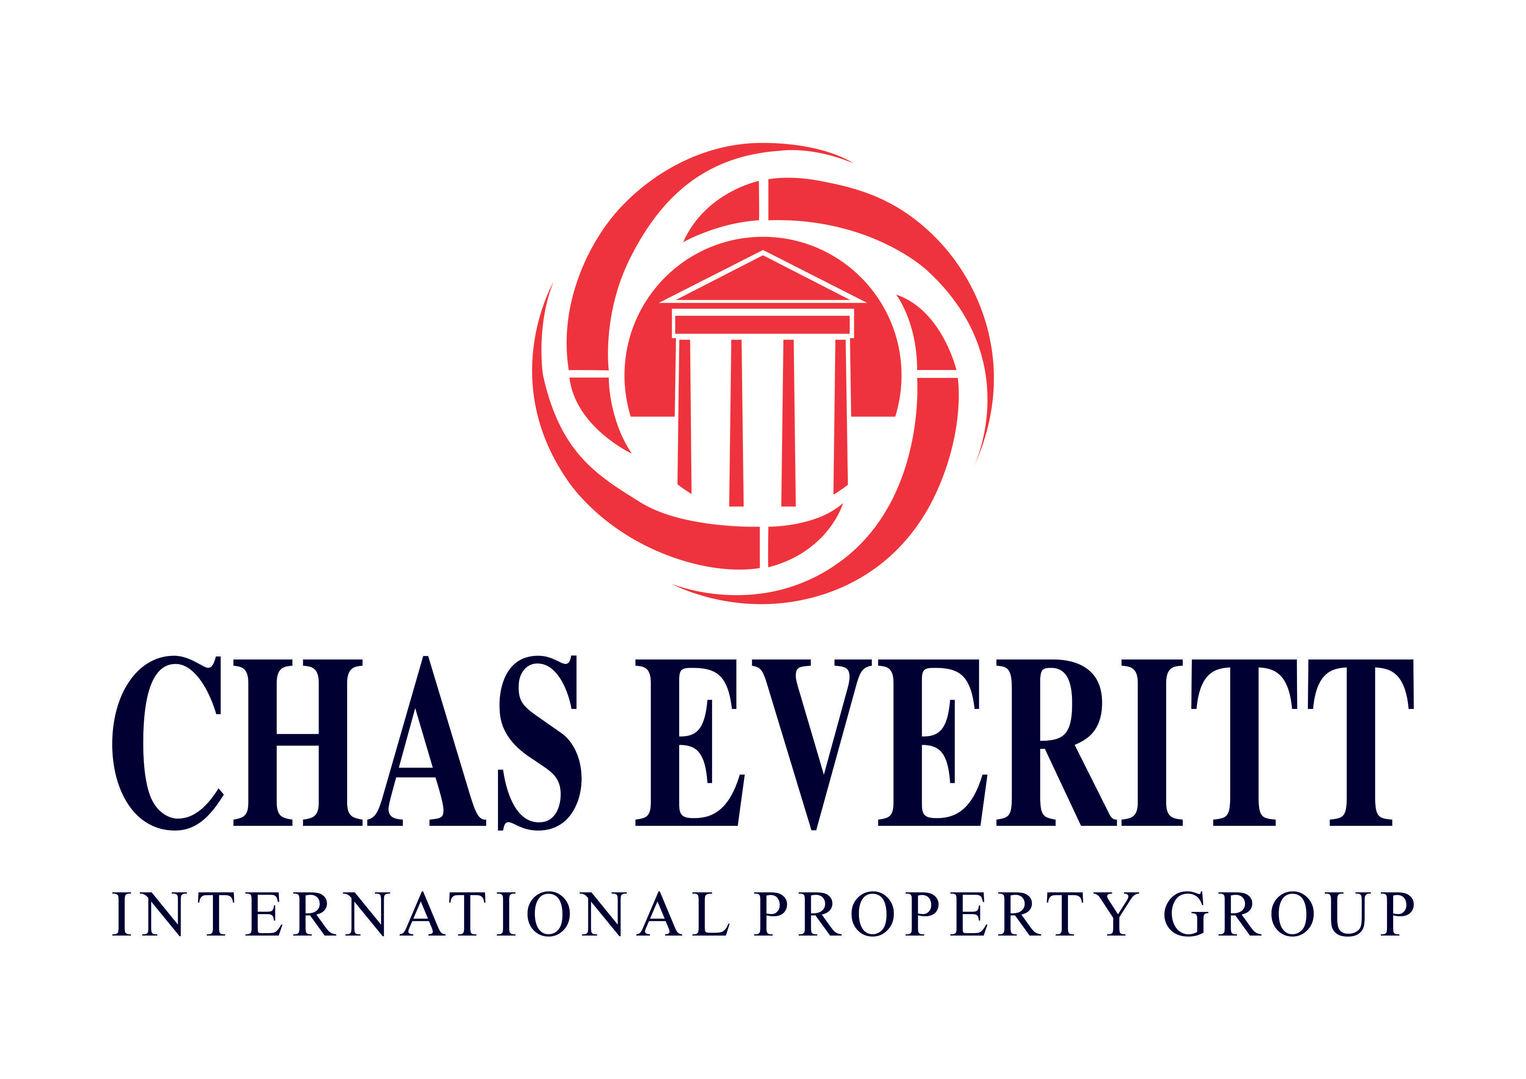 Chas Everitt International Property Grou